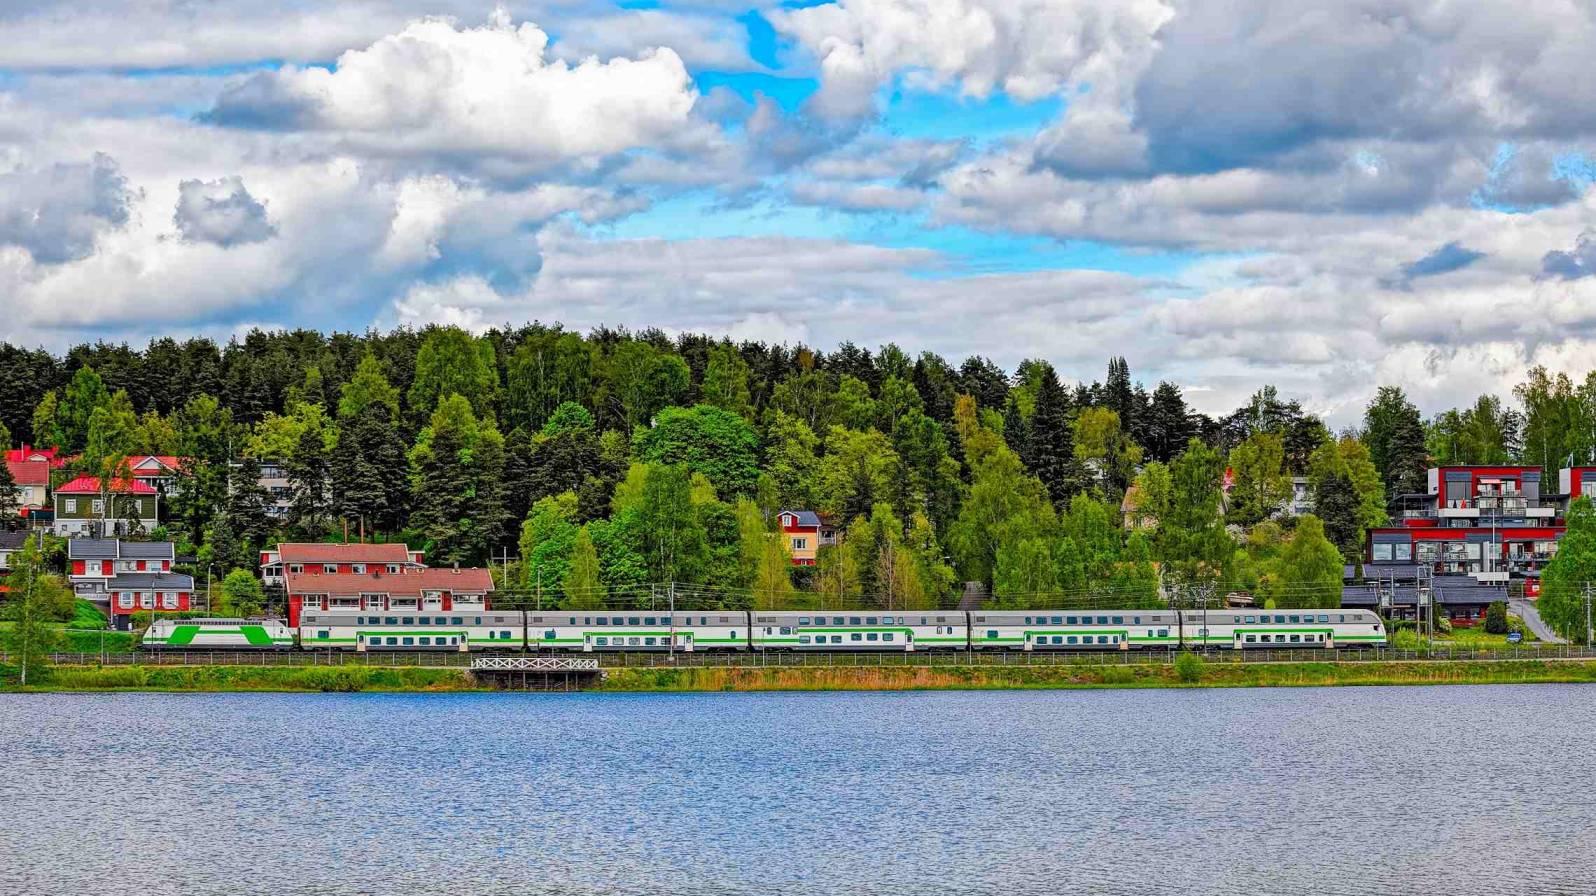 Intercity-juna-Kristina-RAILS-1596x896.jpg